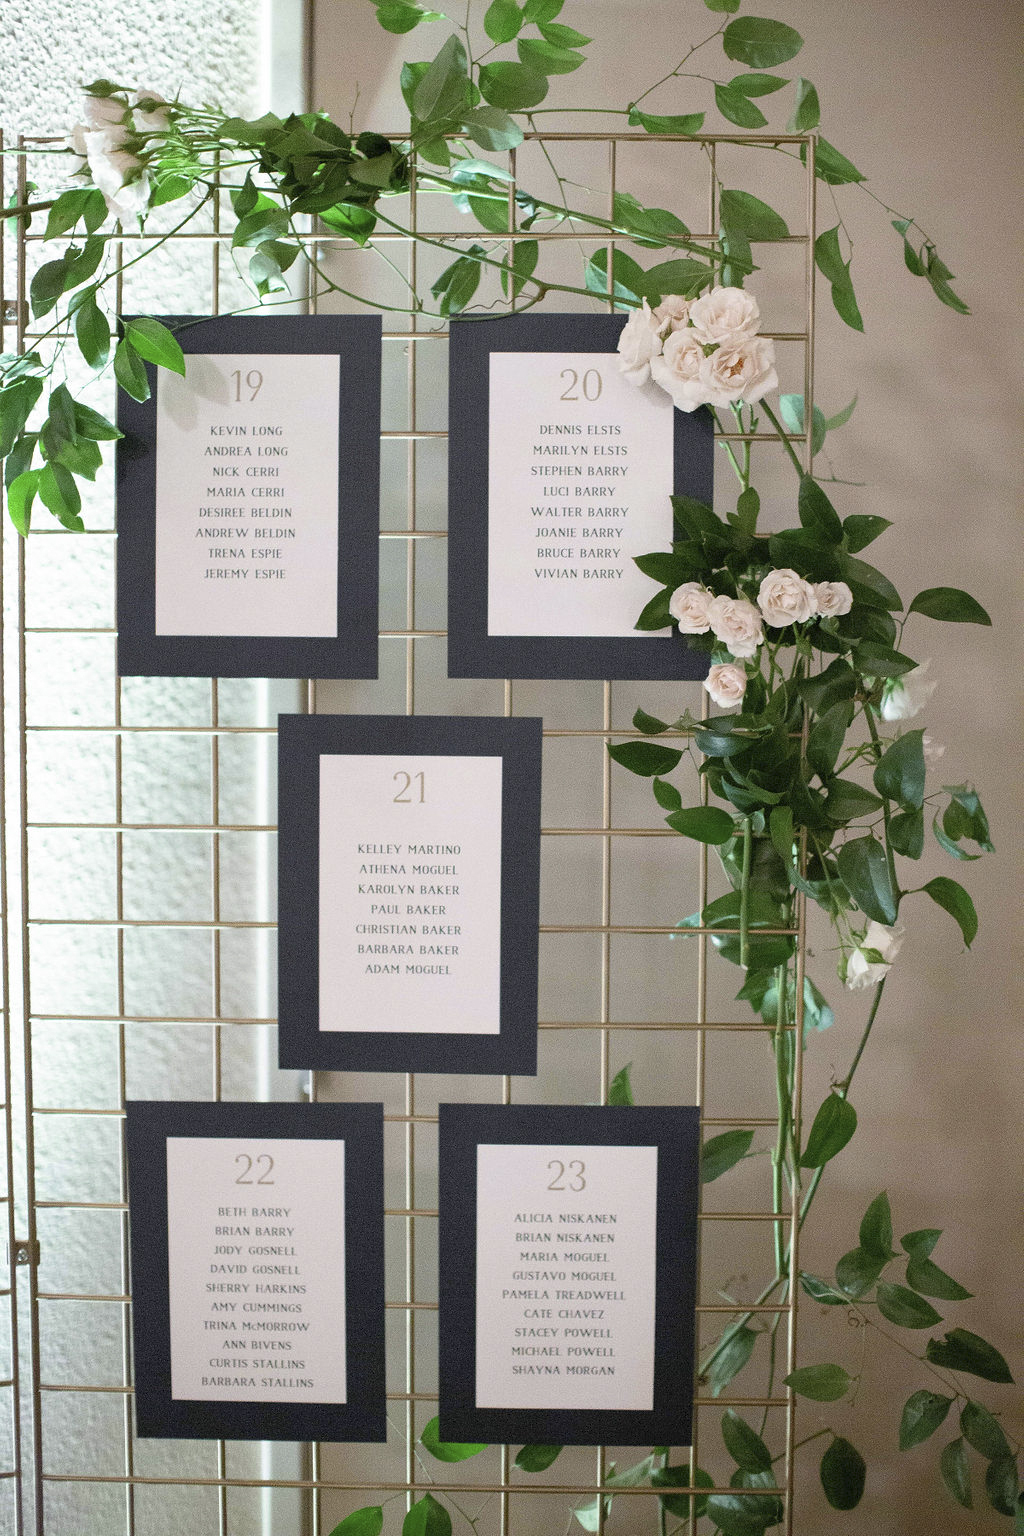 011_reception_portland,oregon,castaway,wedding,by_outlive_creative,photo,and,video.jpg